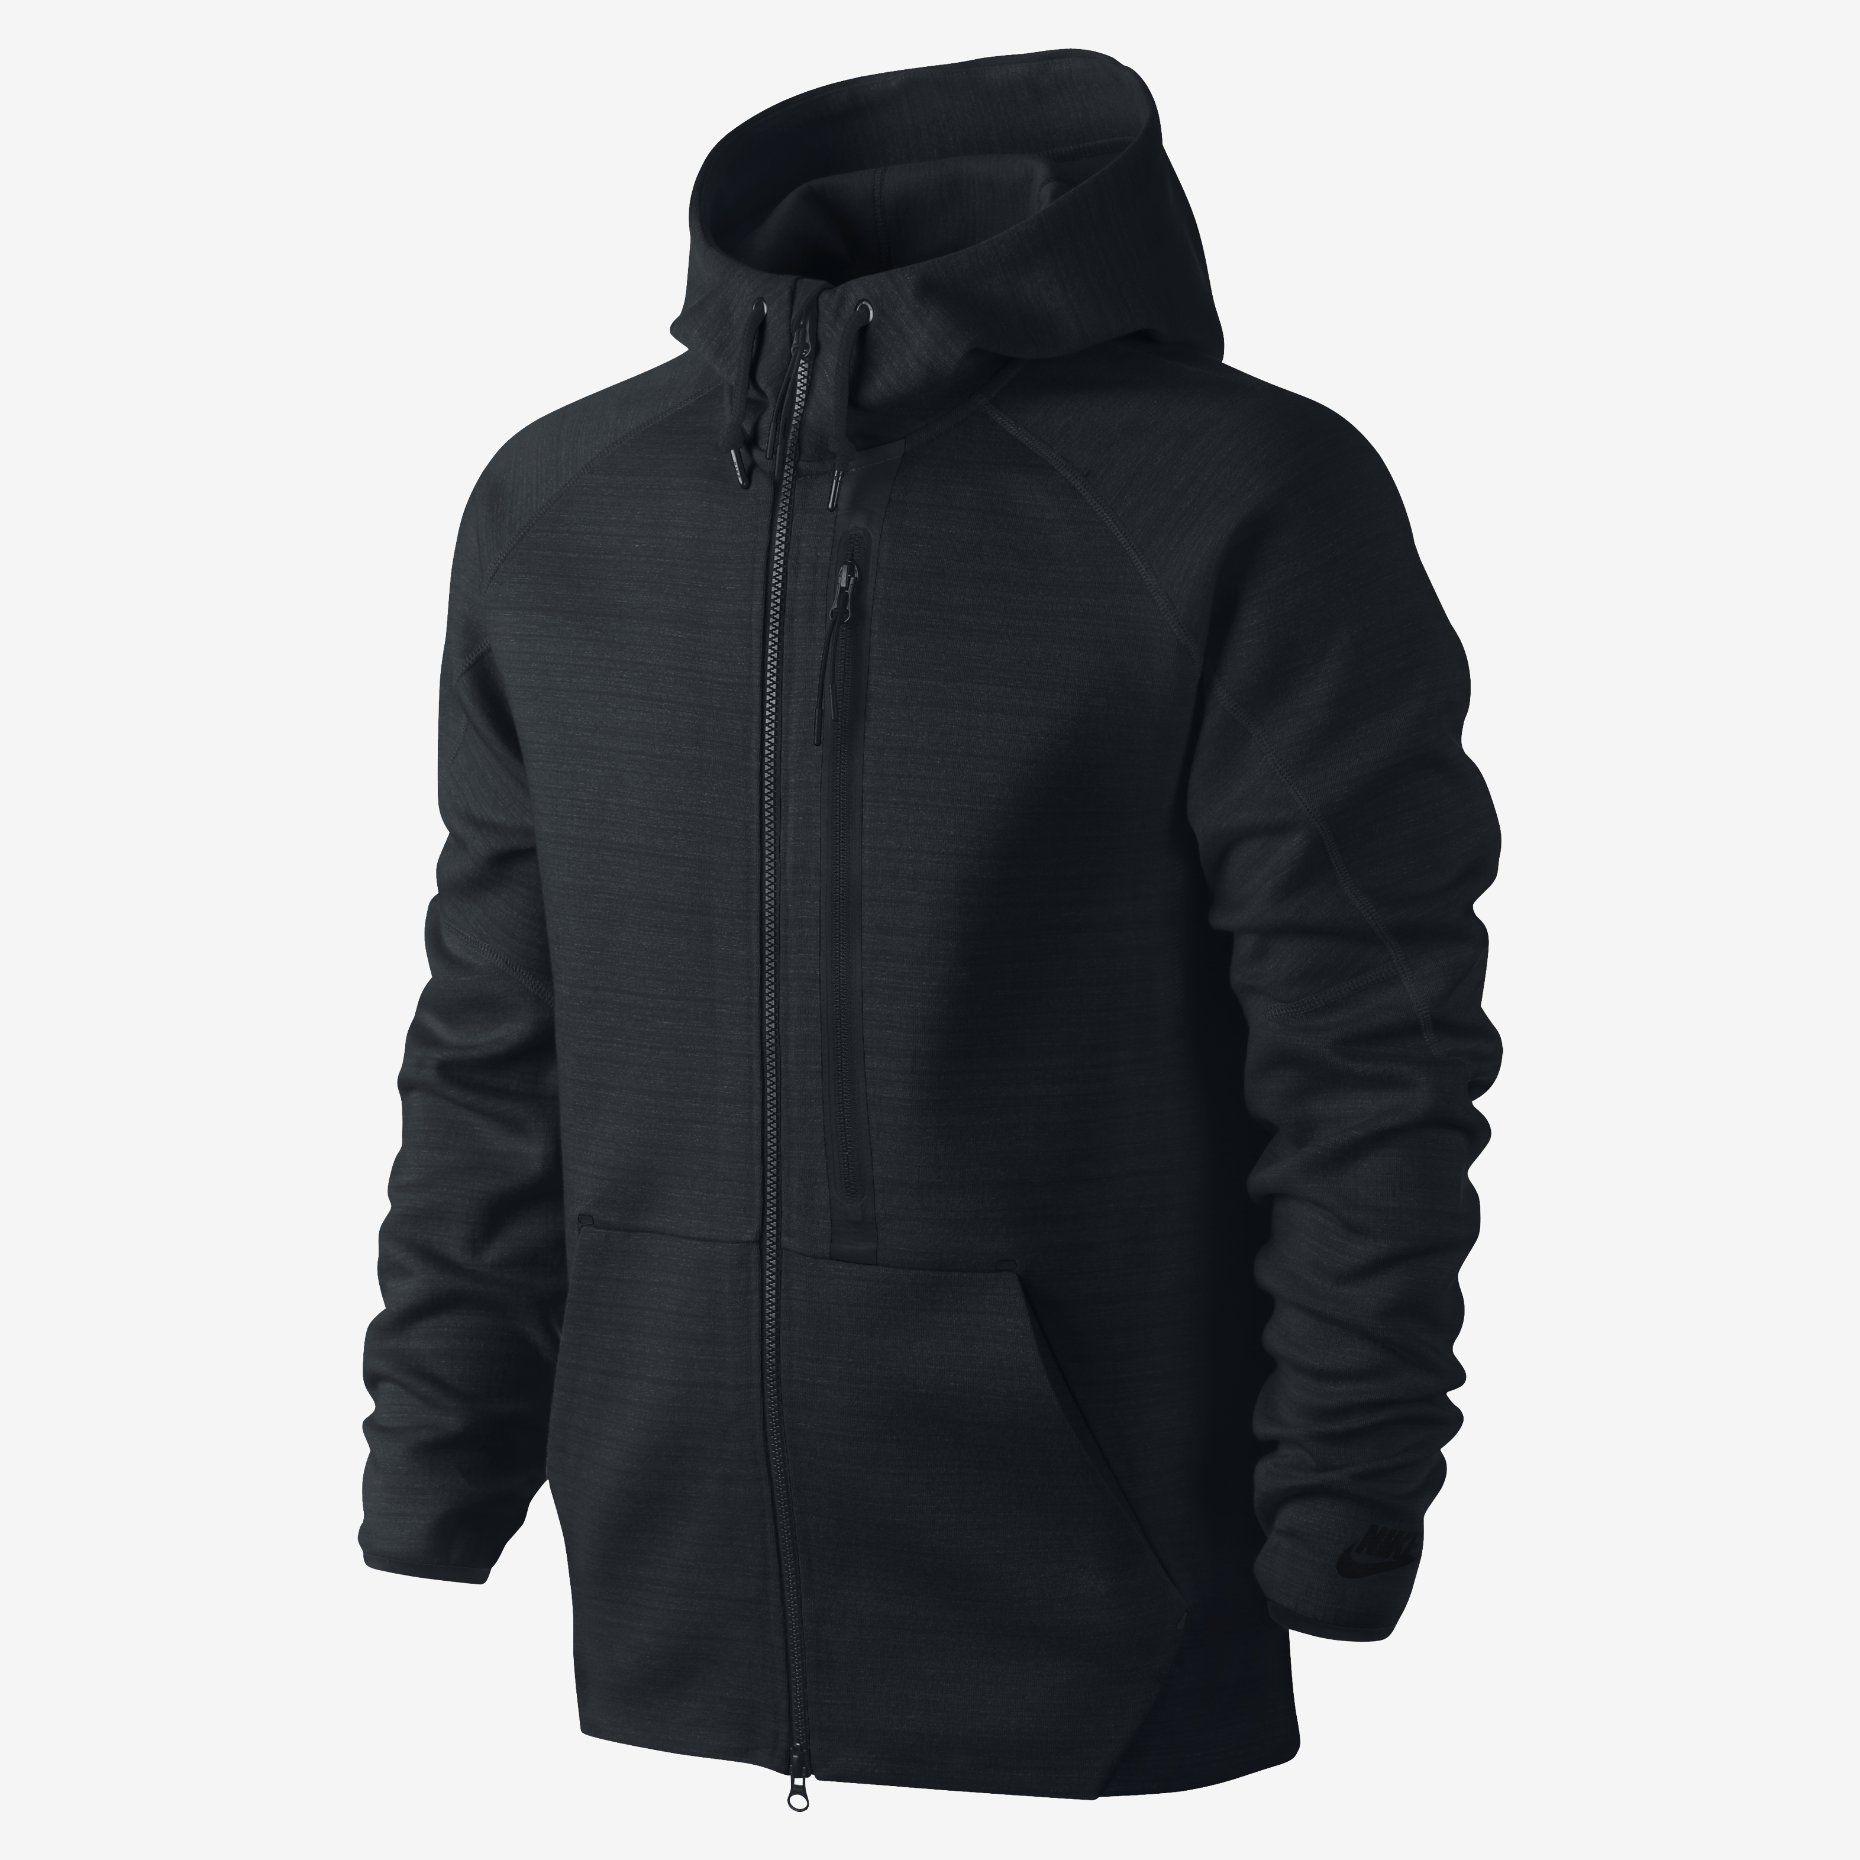 Nike Store. Nike Tech Super 1MM FullZip Men's Hoodie 150